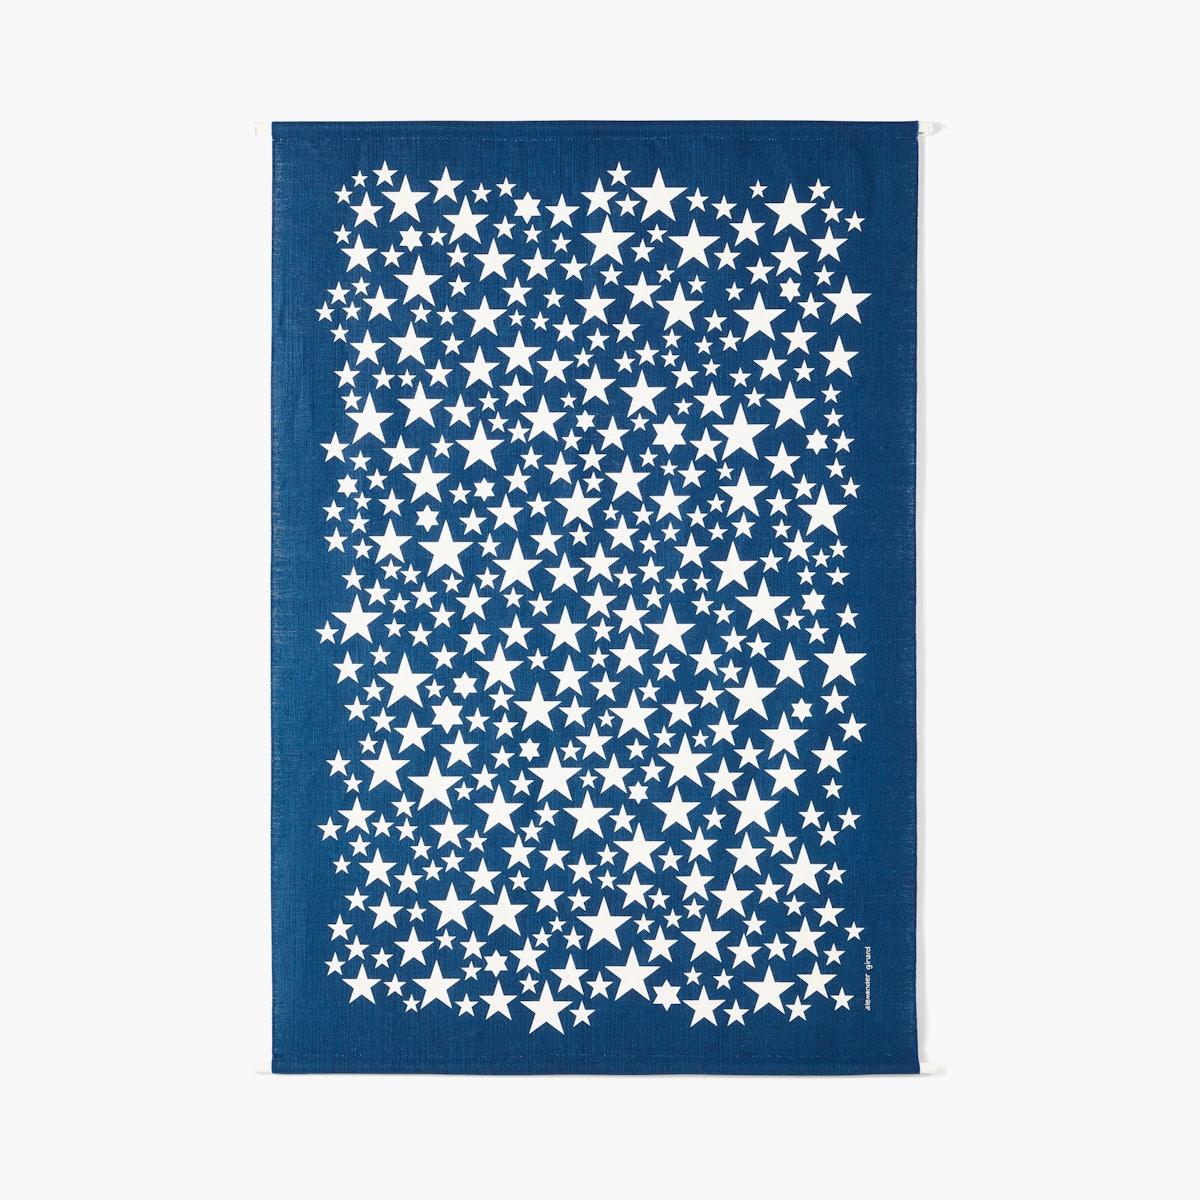 """Stars"" by Alexander Girard"